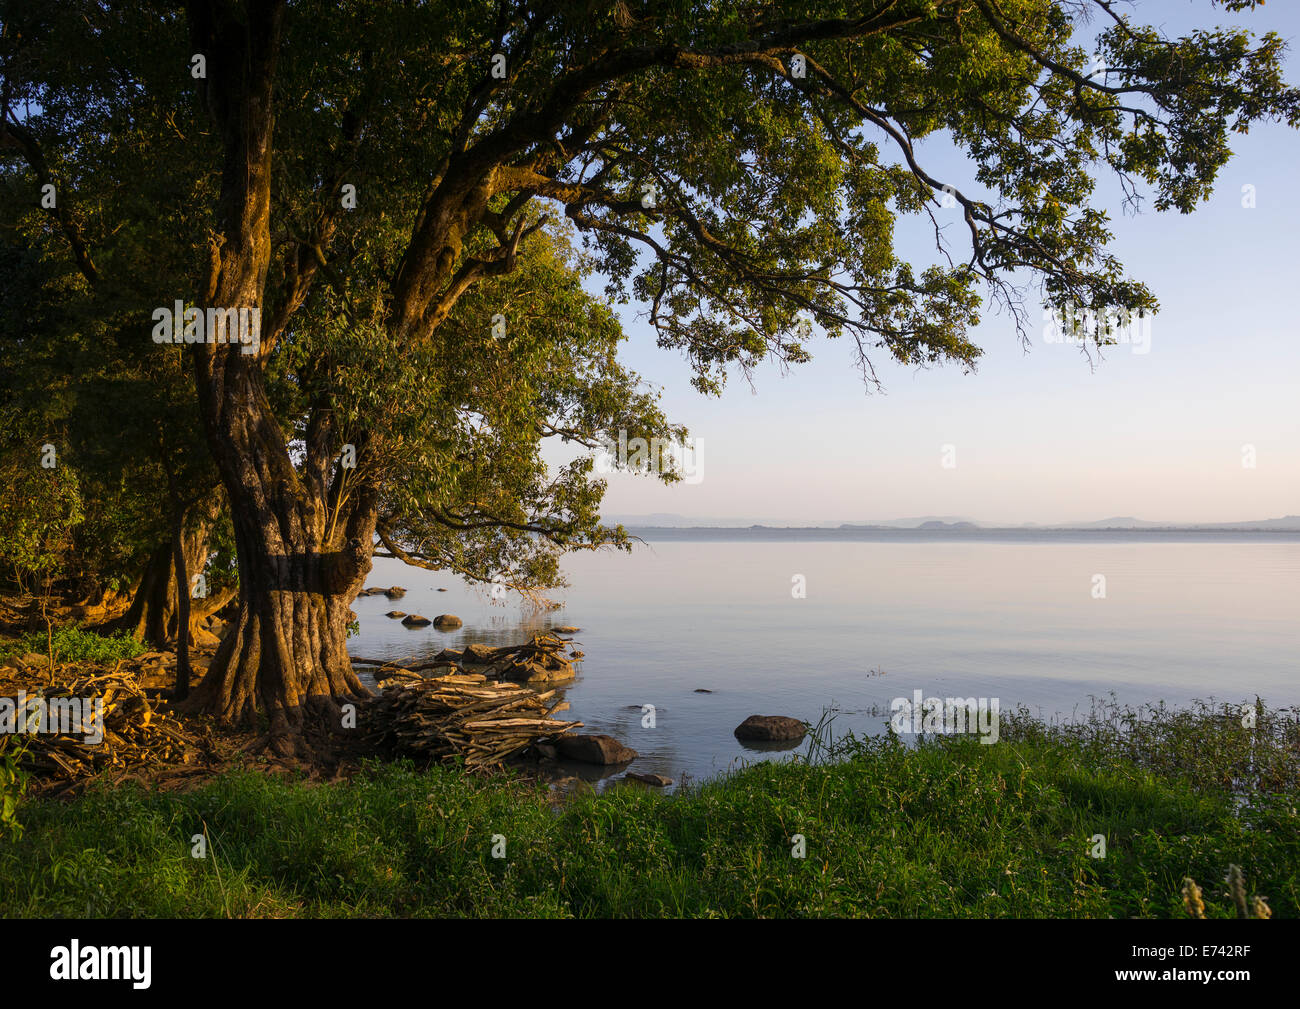 Lake Tana, Bahir Dar, Ethiopia - Stock Image